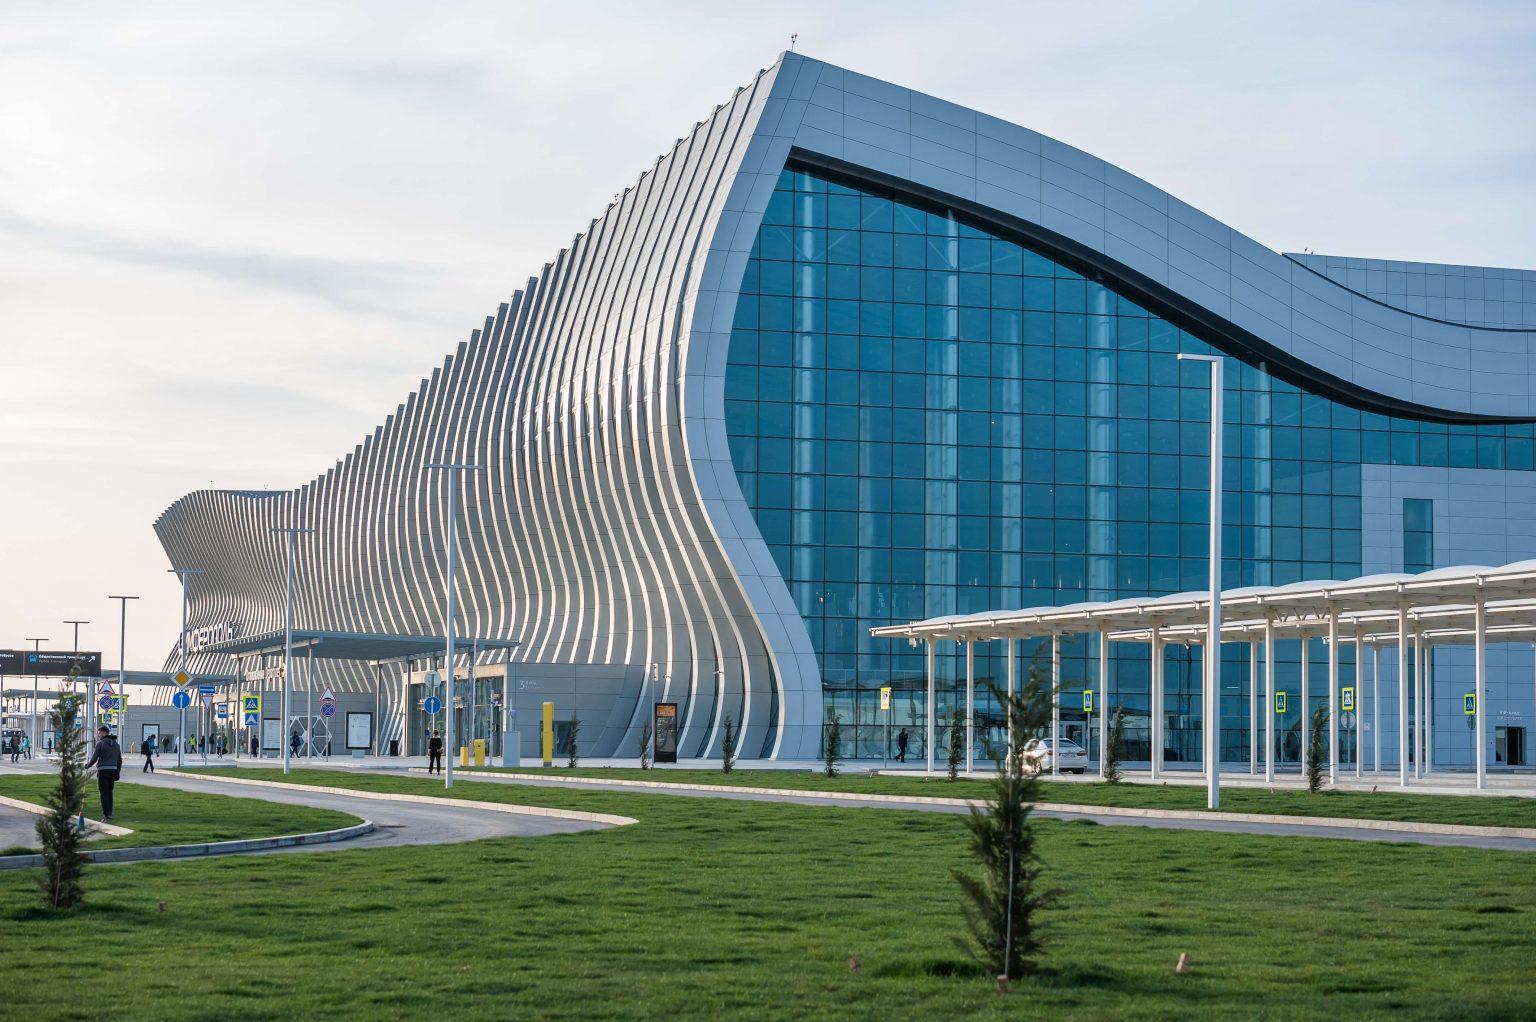 В аэропорту Симферополя у мужчины остановилось сердце